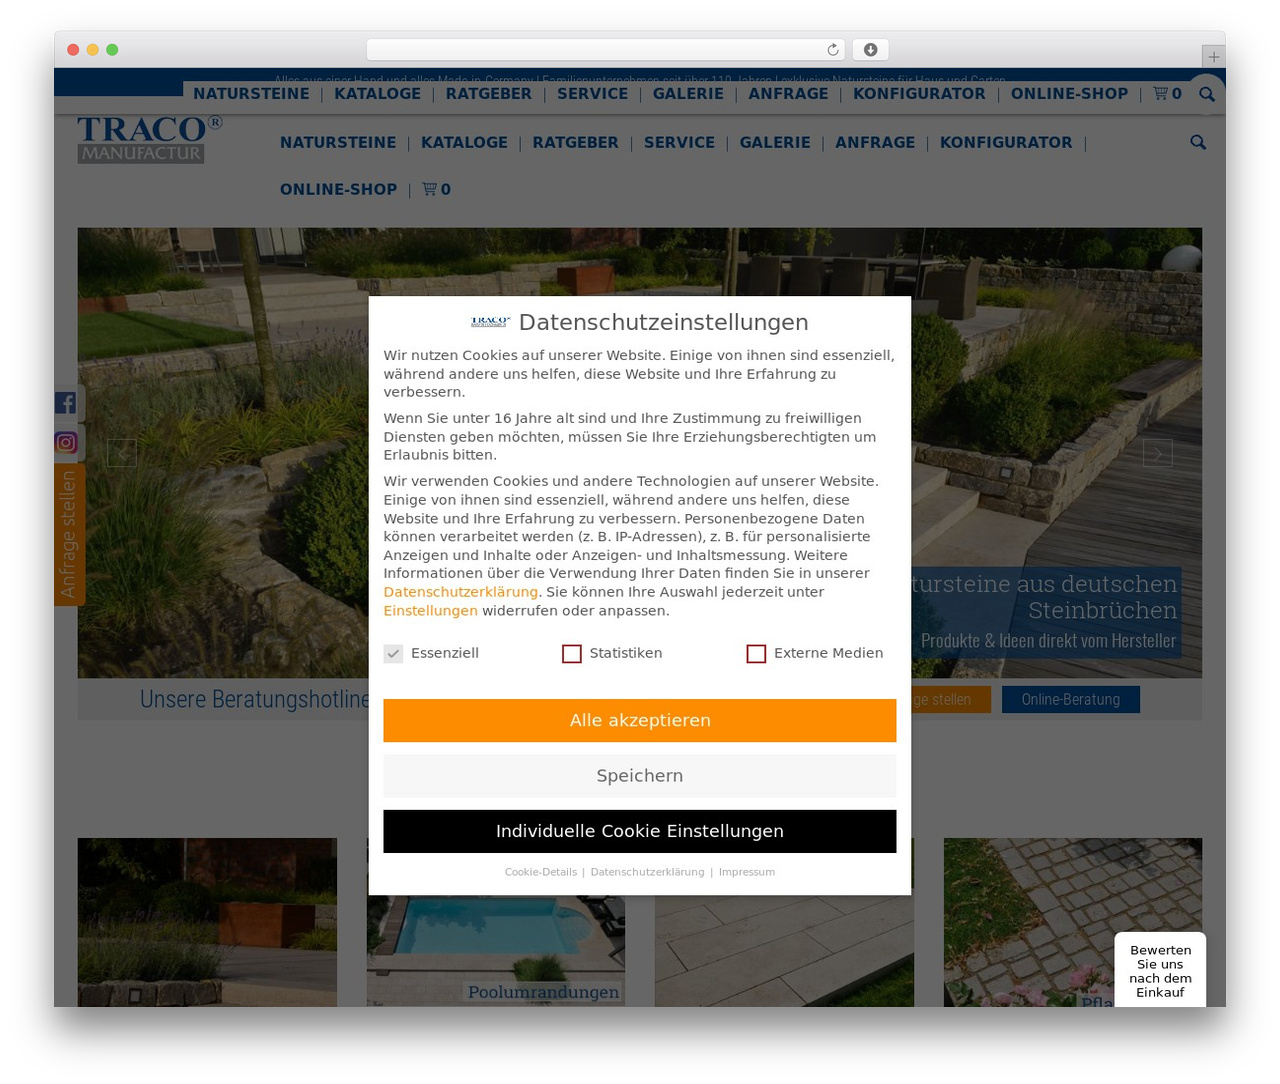 TRACO - Manufactur best WordPress template - traco-manufactur.de